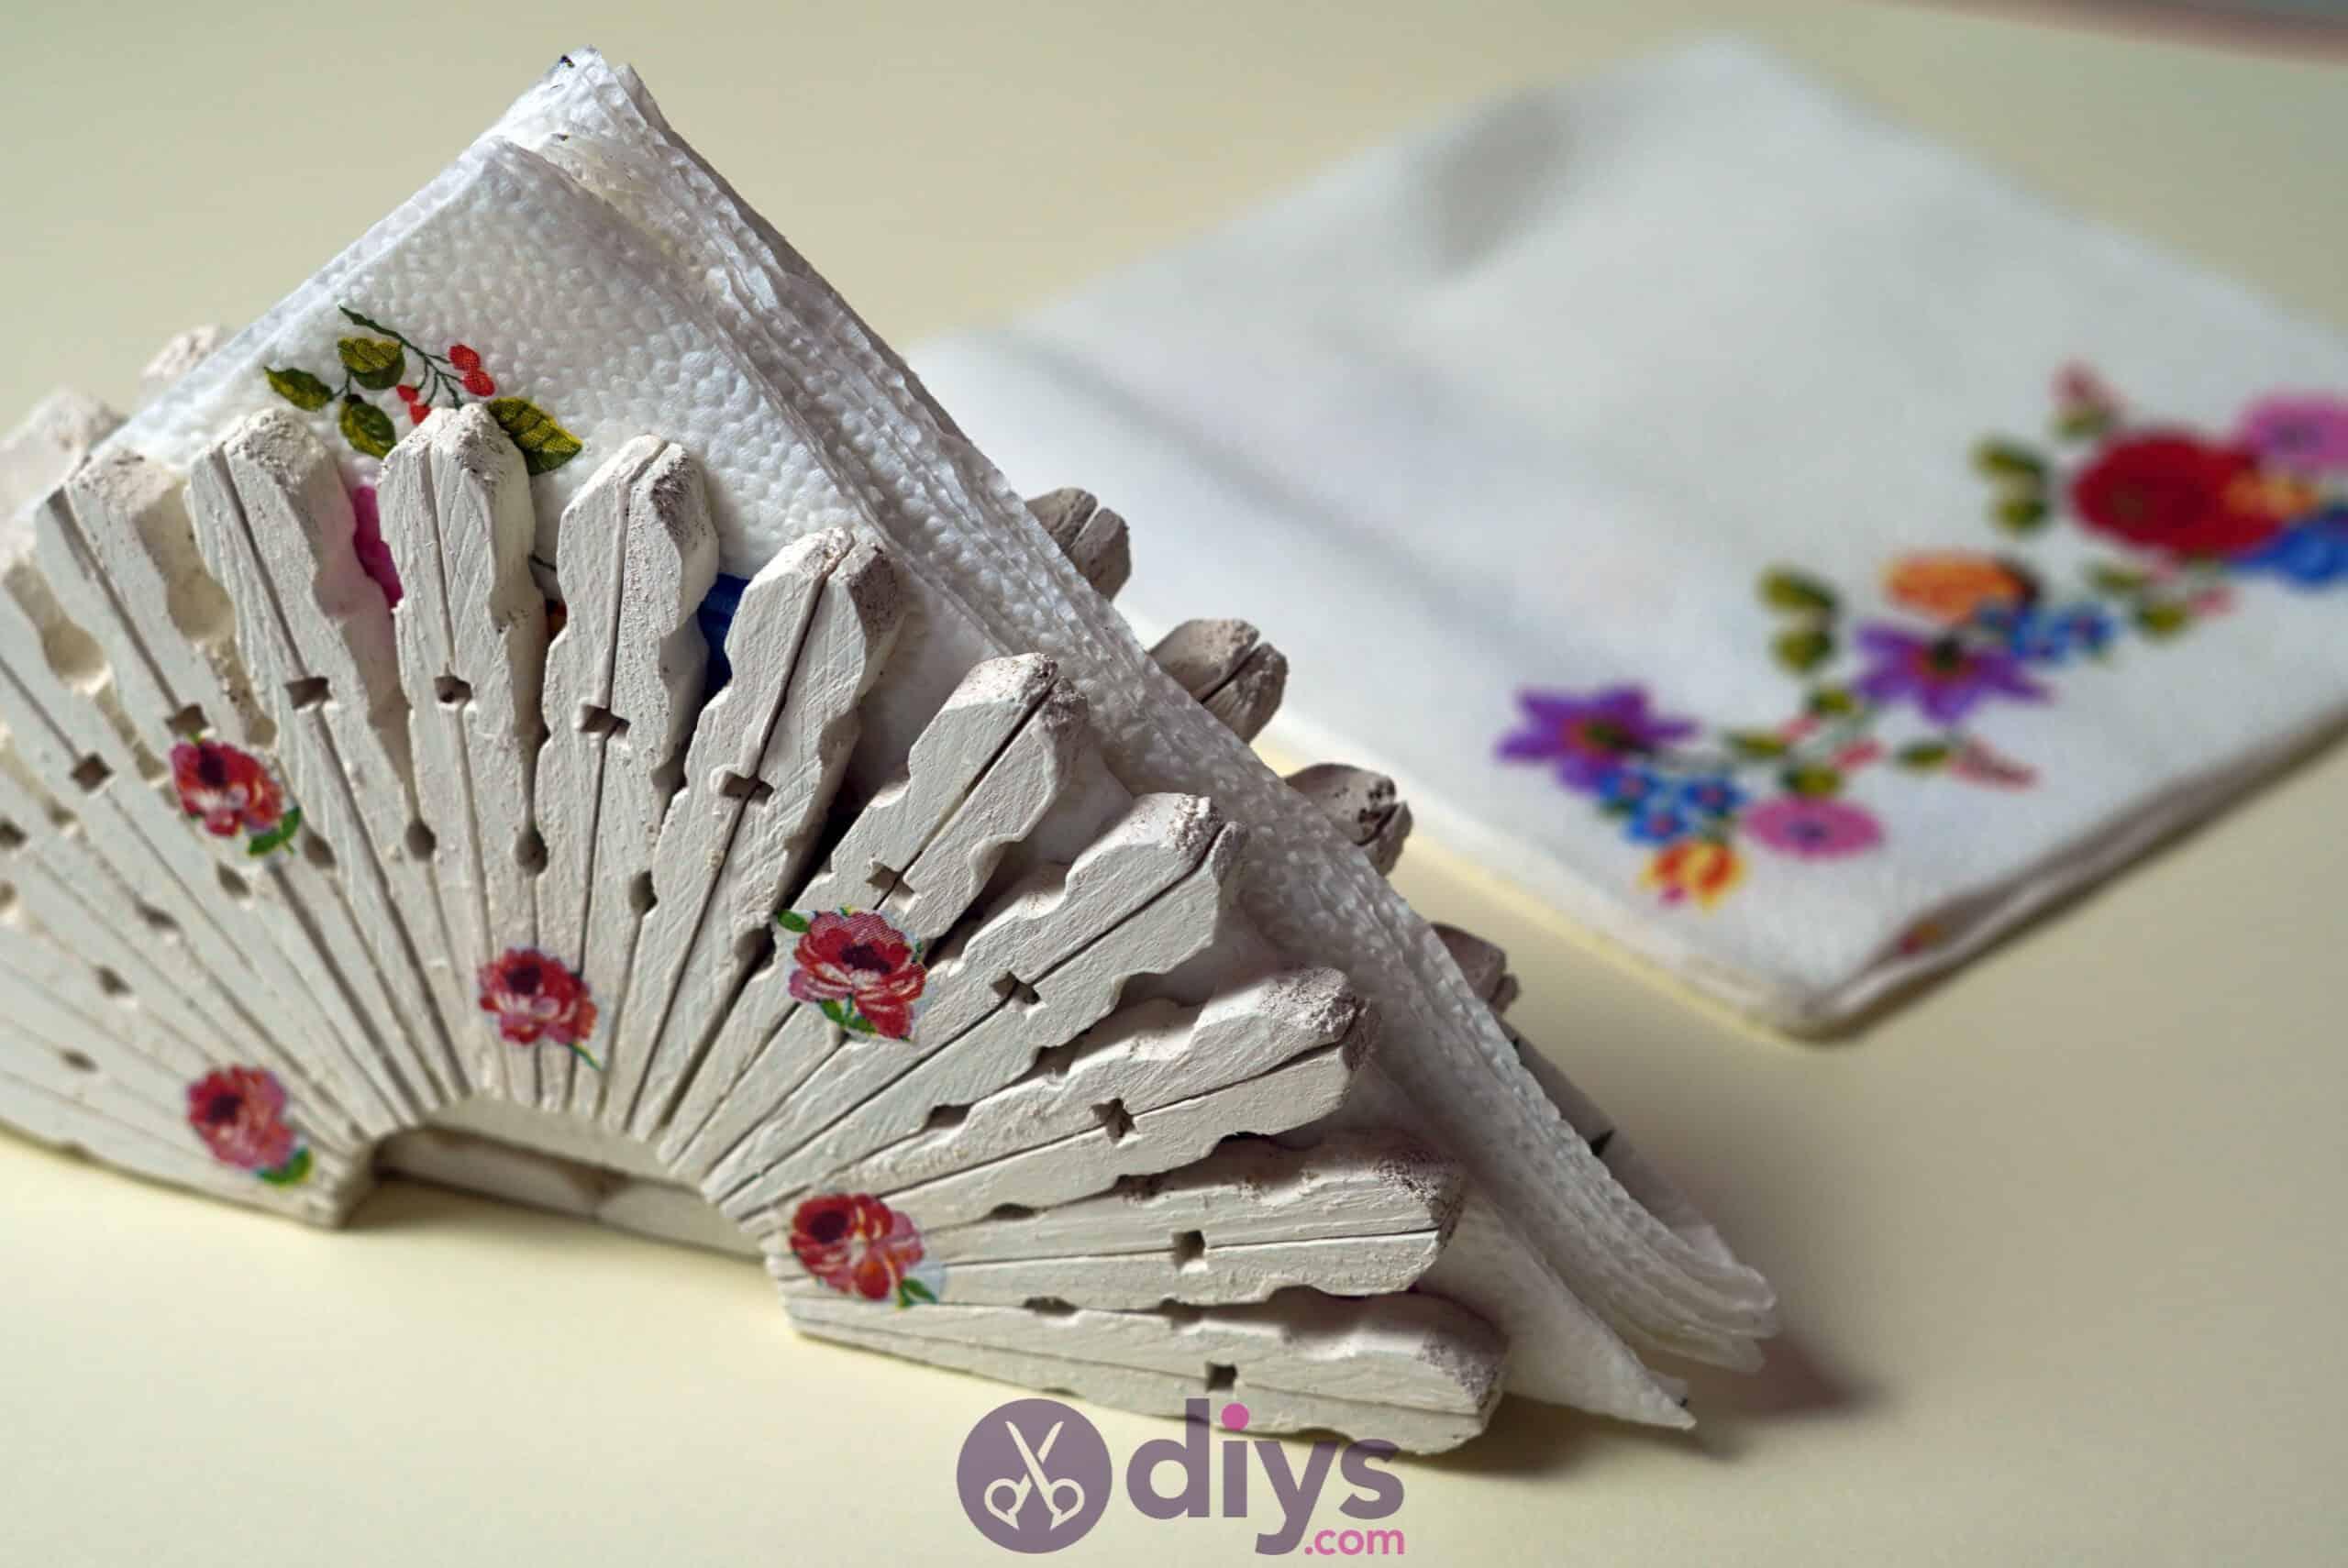 Diy clothespin napkin holder